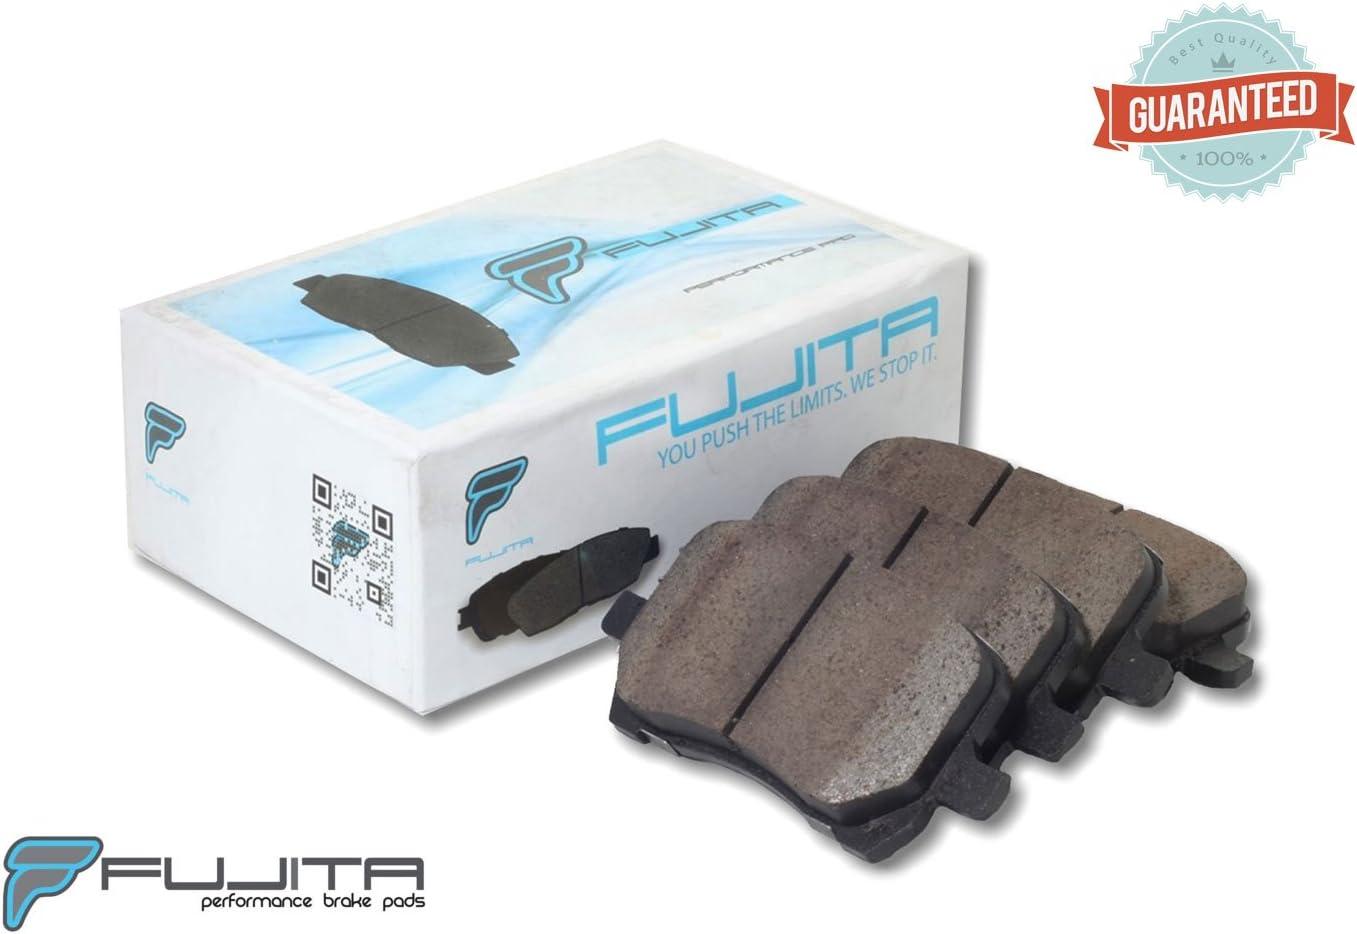 Fujita Brake compatible with Chevrolet, Pontiac, Saturn - FB10280 Street Performance Ceramic Brake pad set